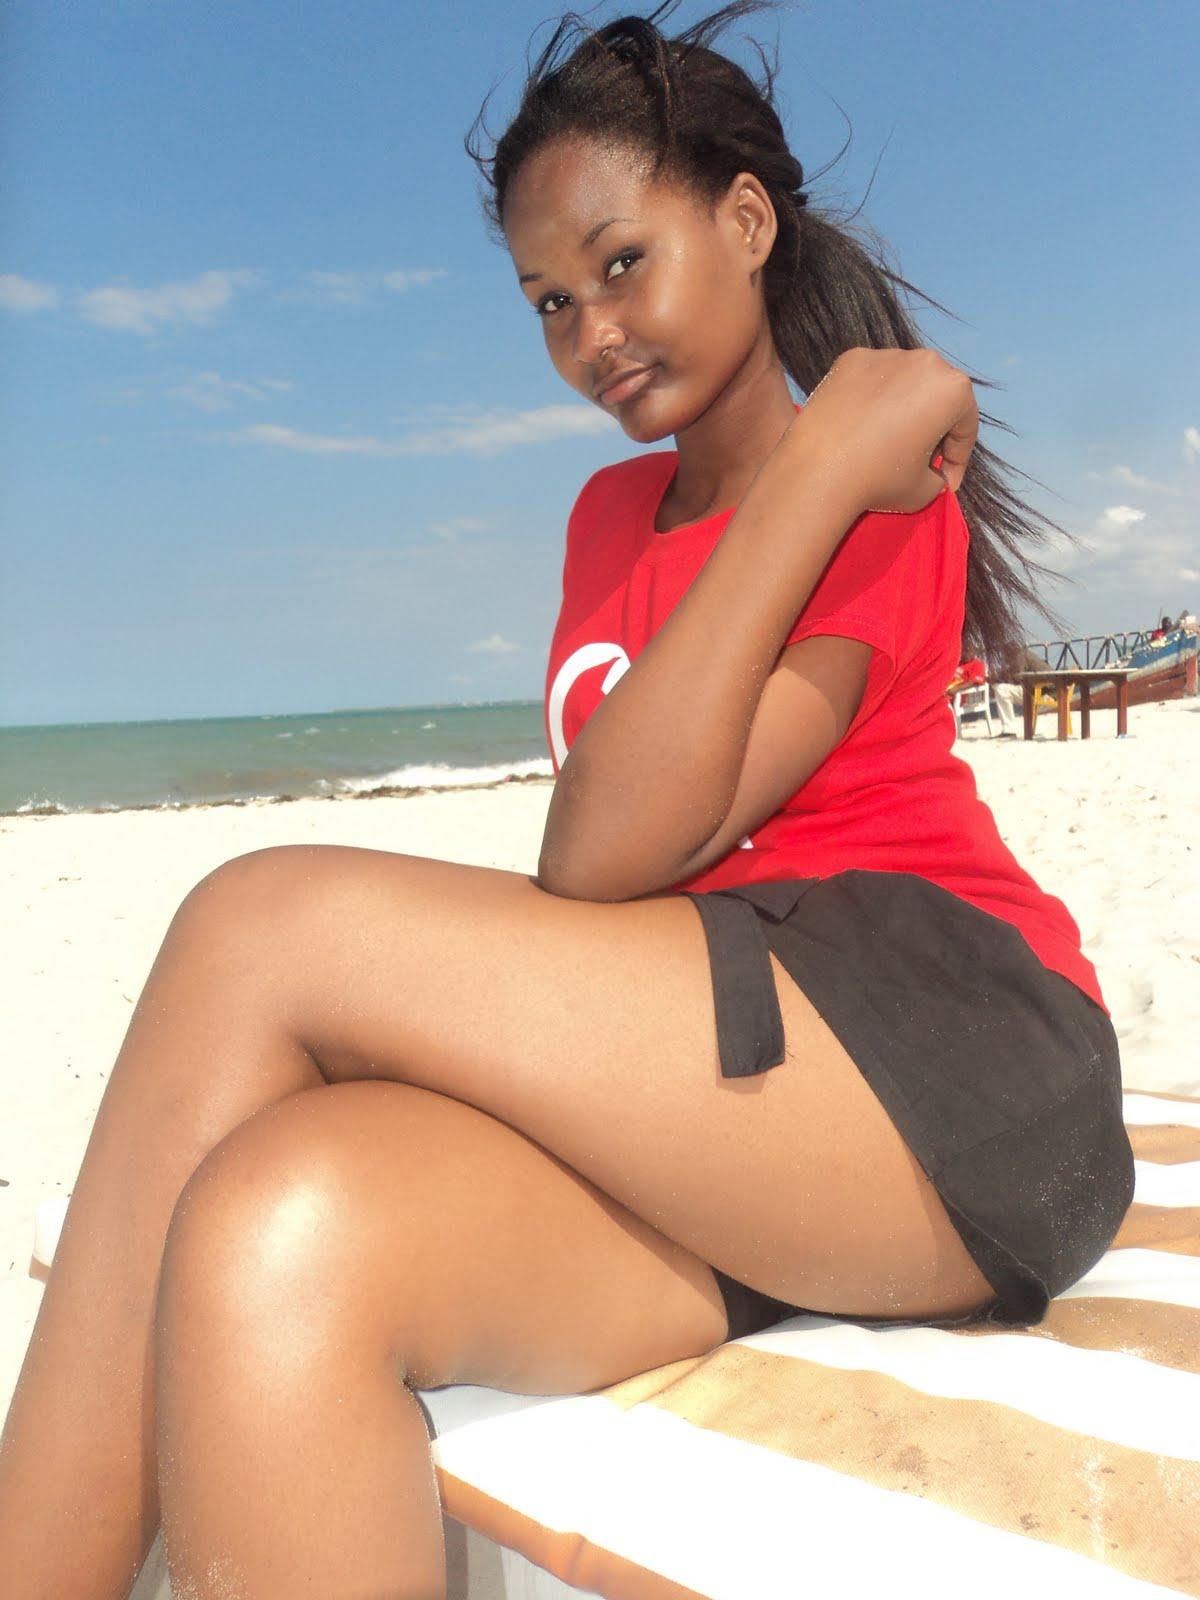 picha uchi news irene uwoya utupu pictures